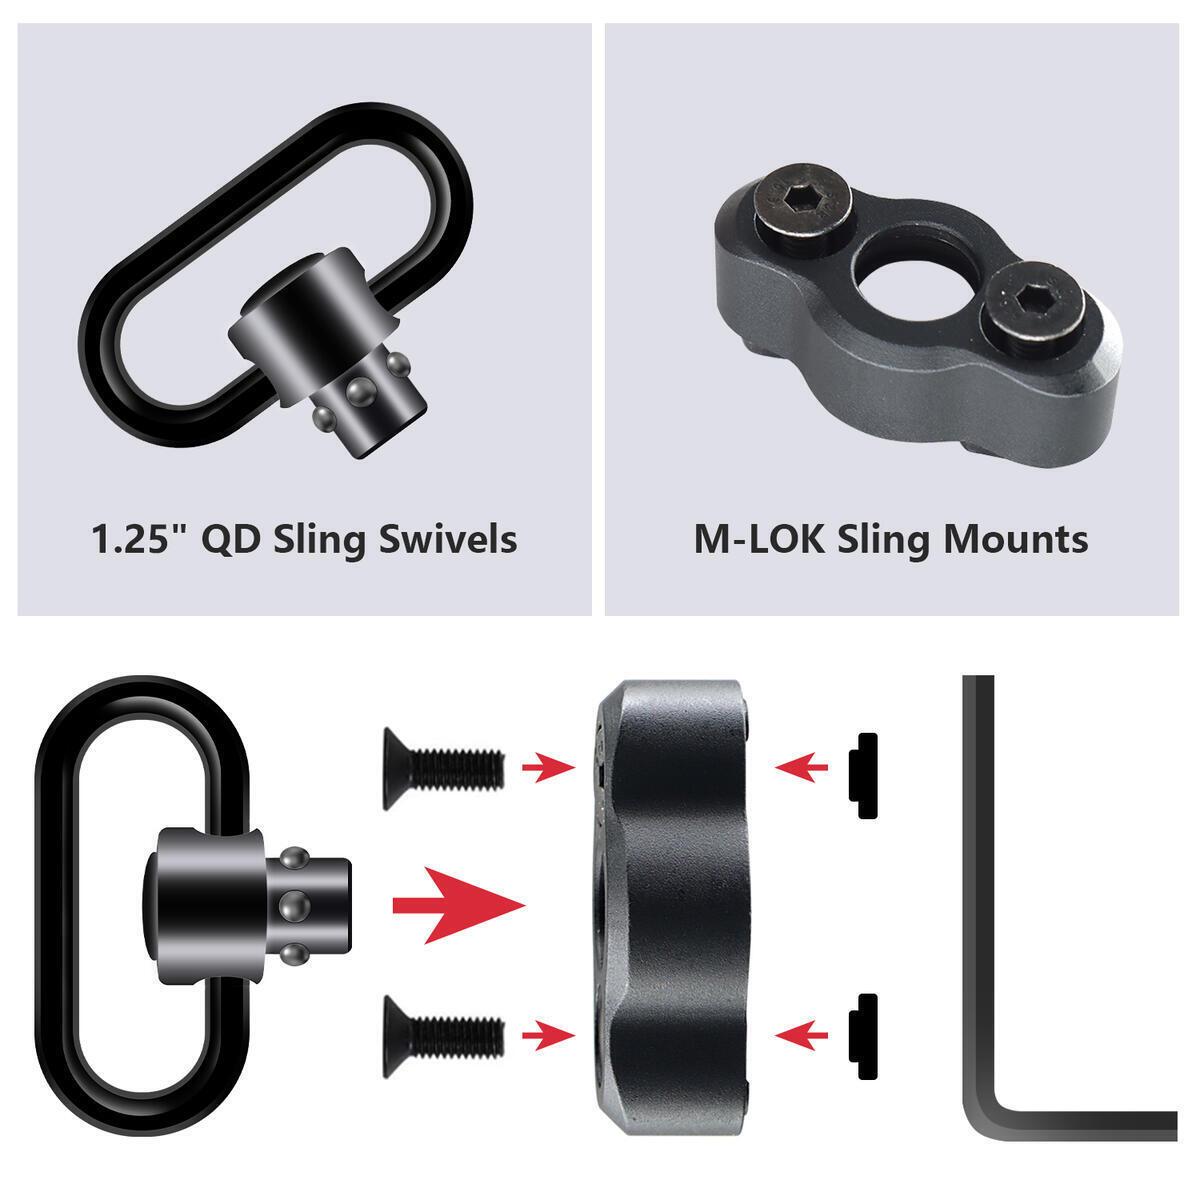 QD Sling Swivel, M-lok Sling Mount, QD Quick Detach/Release 1.25